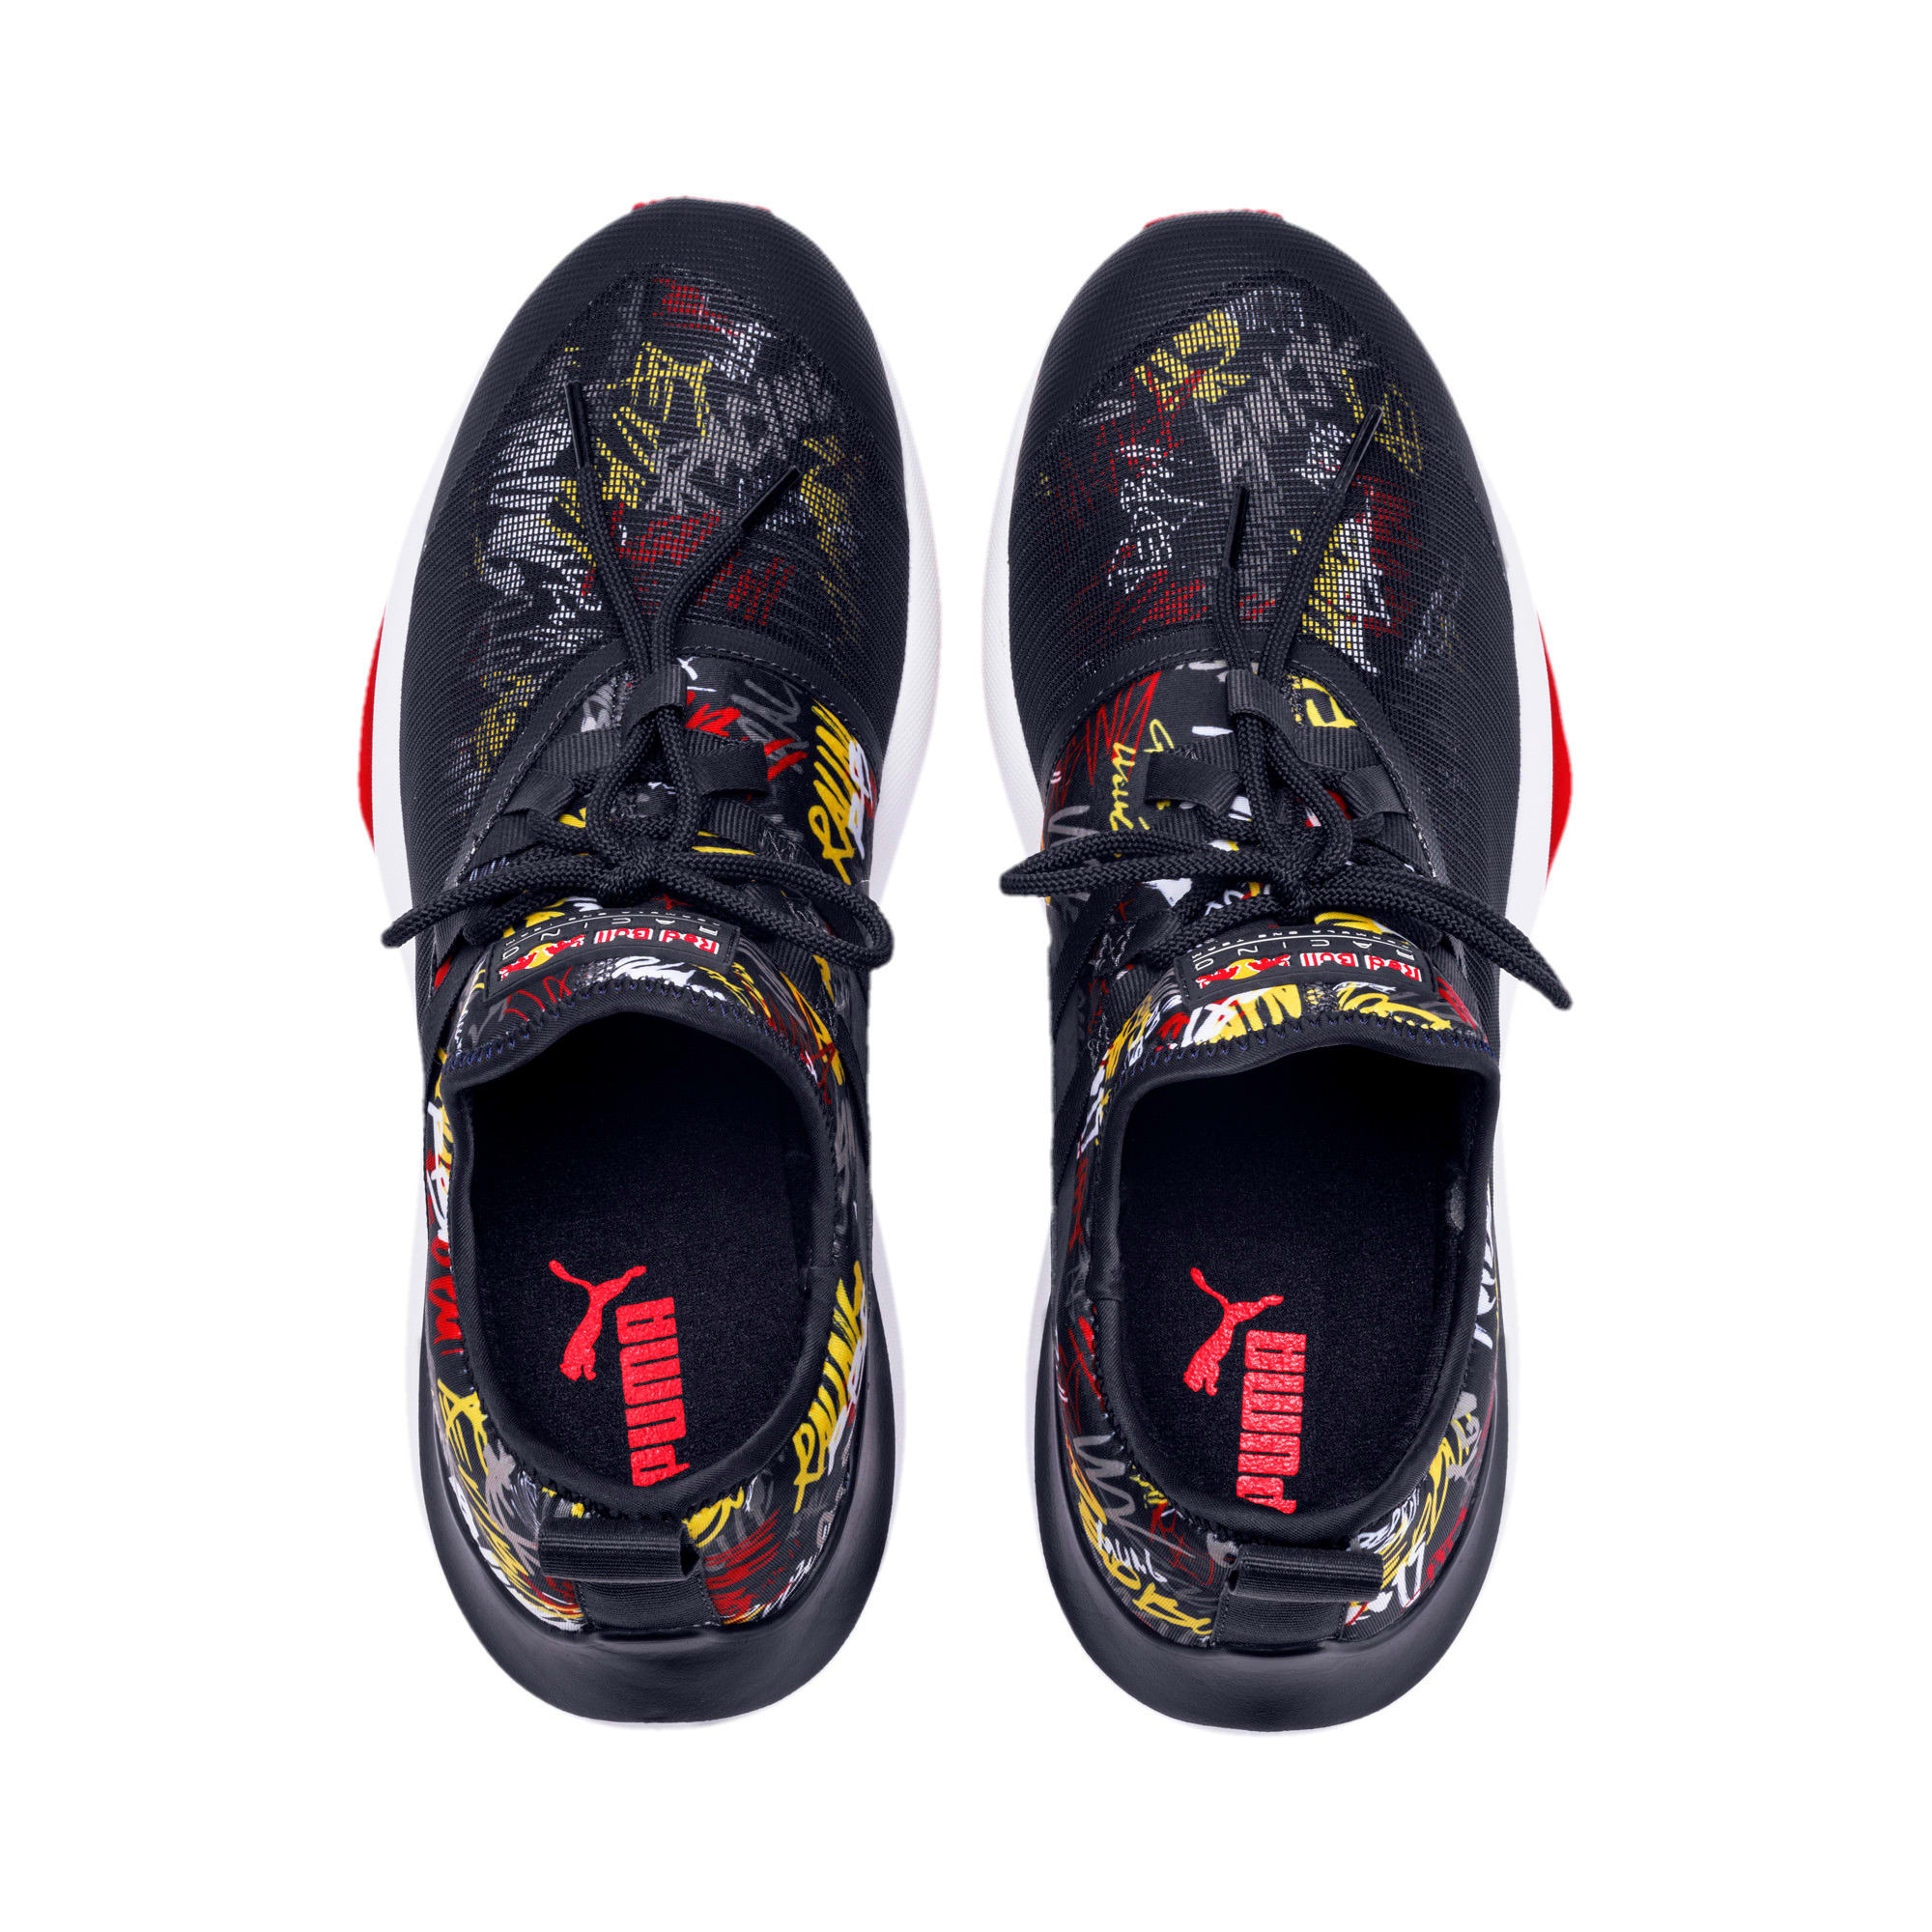 Thumbnail 7 of Red Bull Racing Evo Cat II Graphic Men's Training Shoes, NIGHT SKY-White-Chinese Red, medium